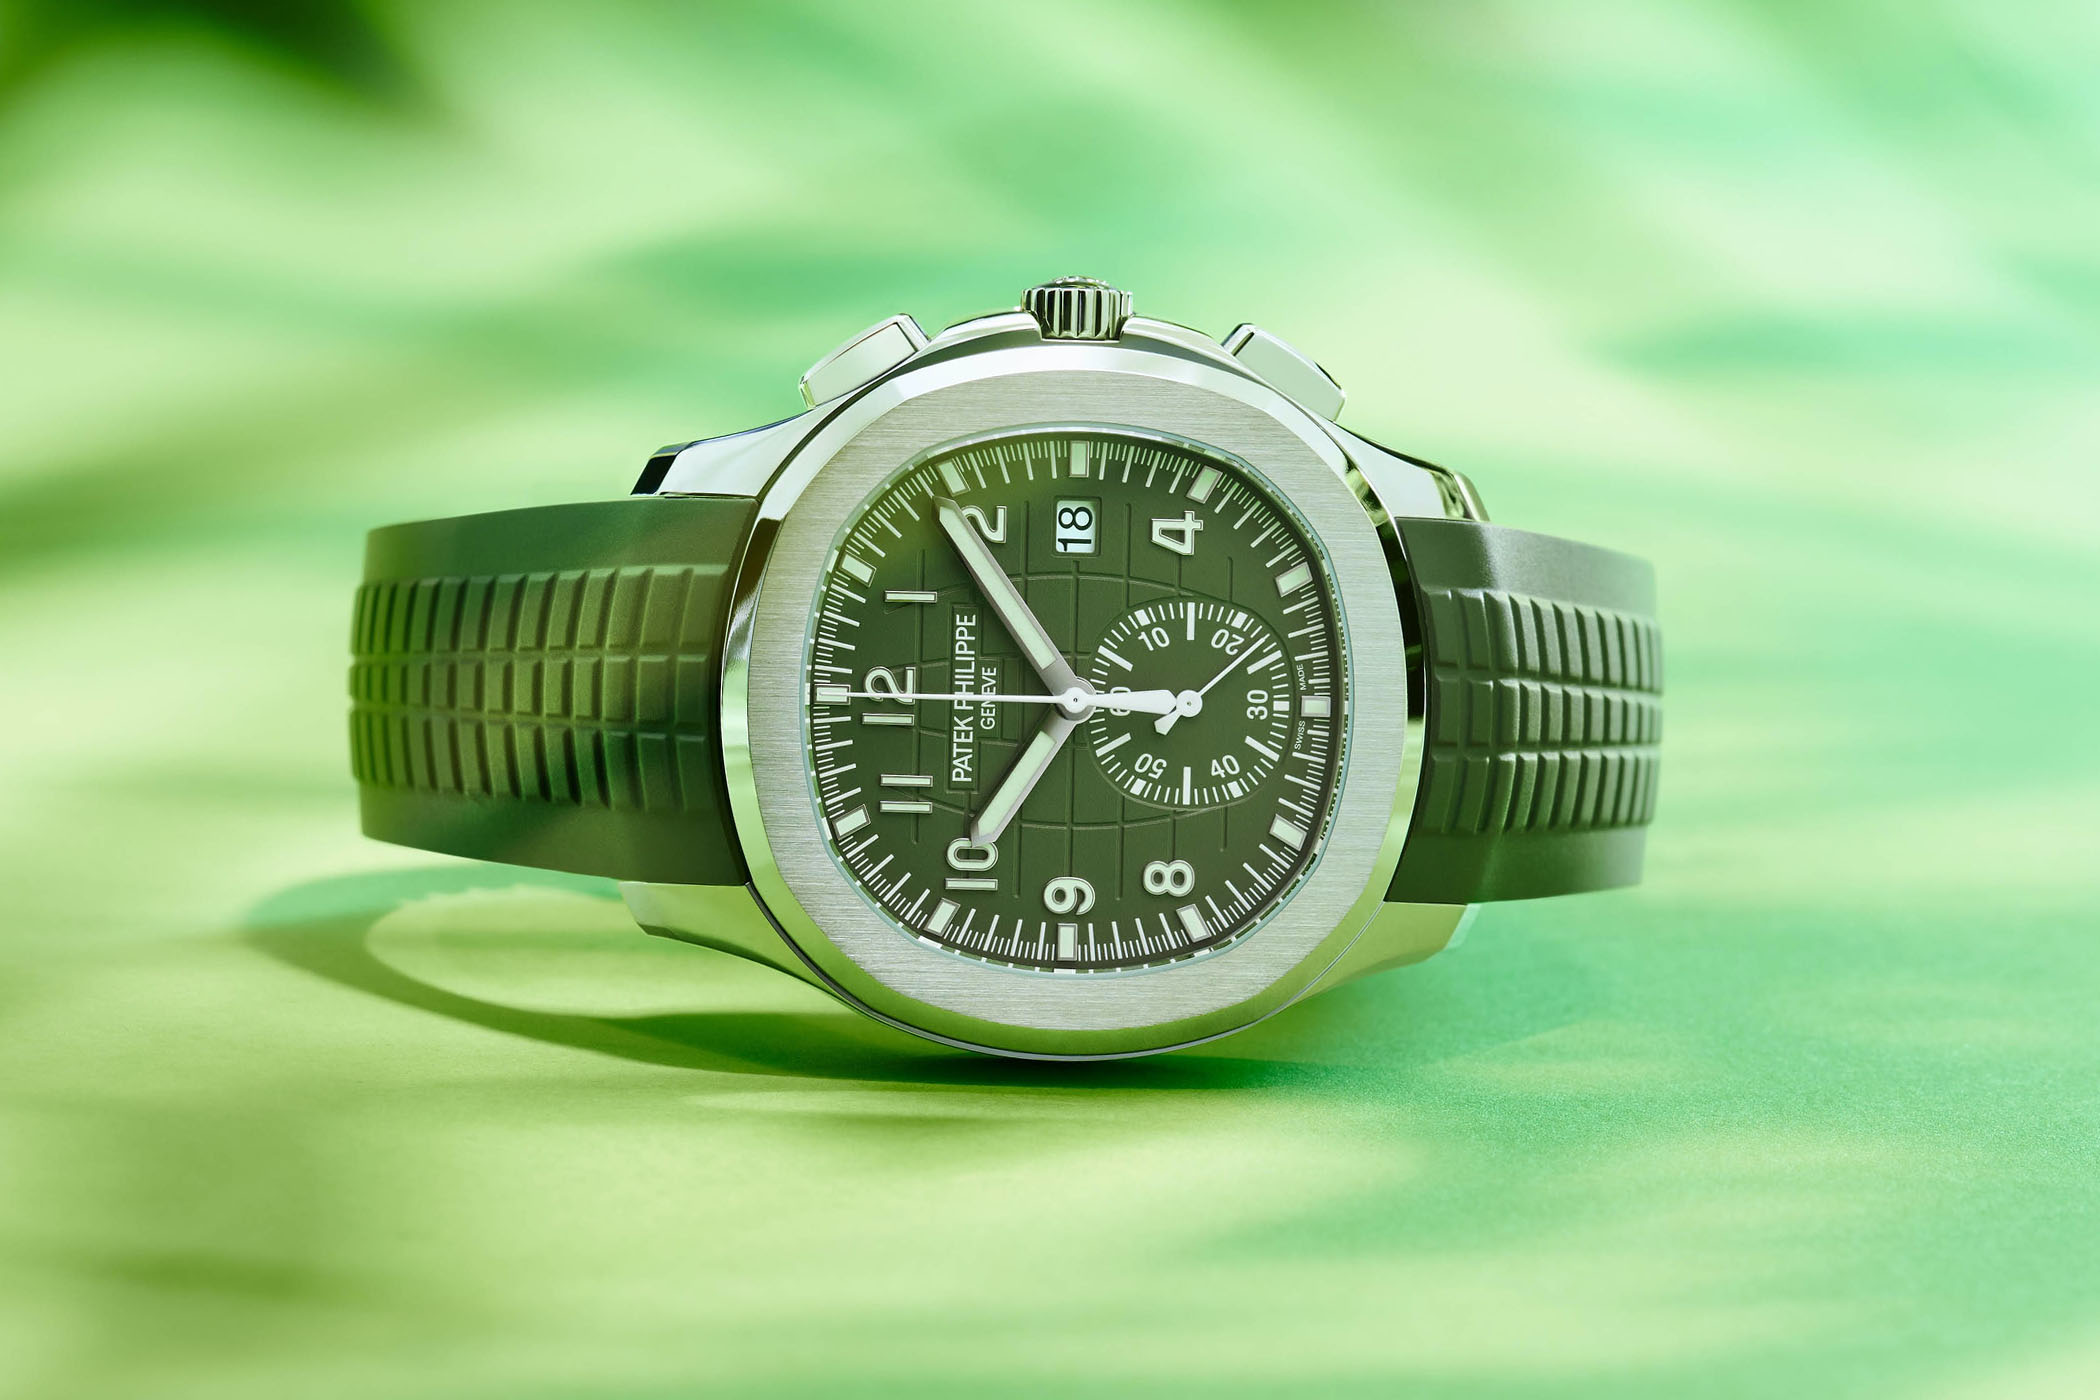 2021 Patek Philippe Aquanaut Chronograph 5968G-010 White gold khaki green dial